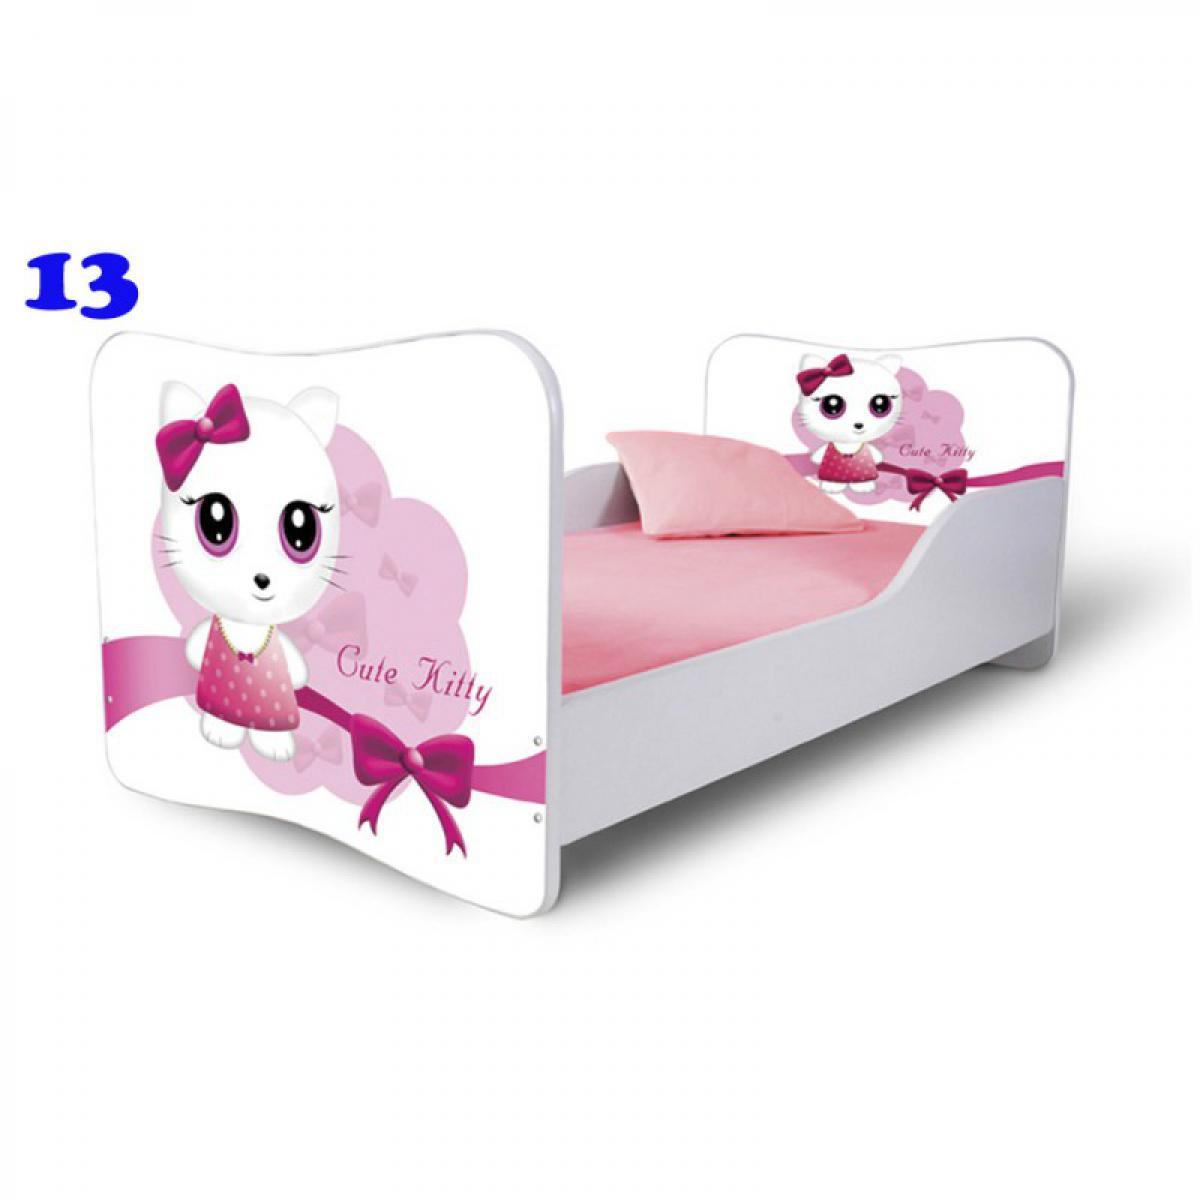 Bim Furniture Lit Enfant 140x70 cm Cute Kitty Blanc avec sommier et matelas